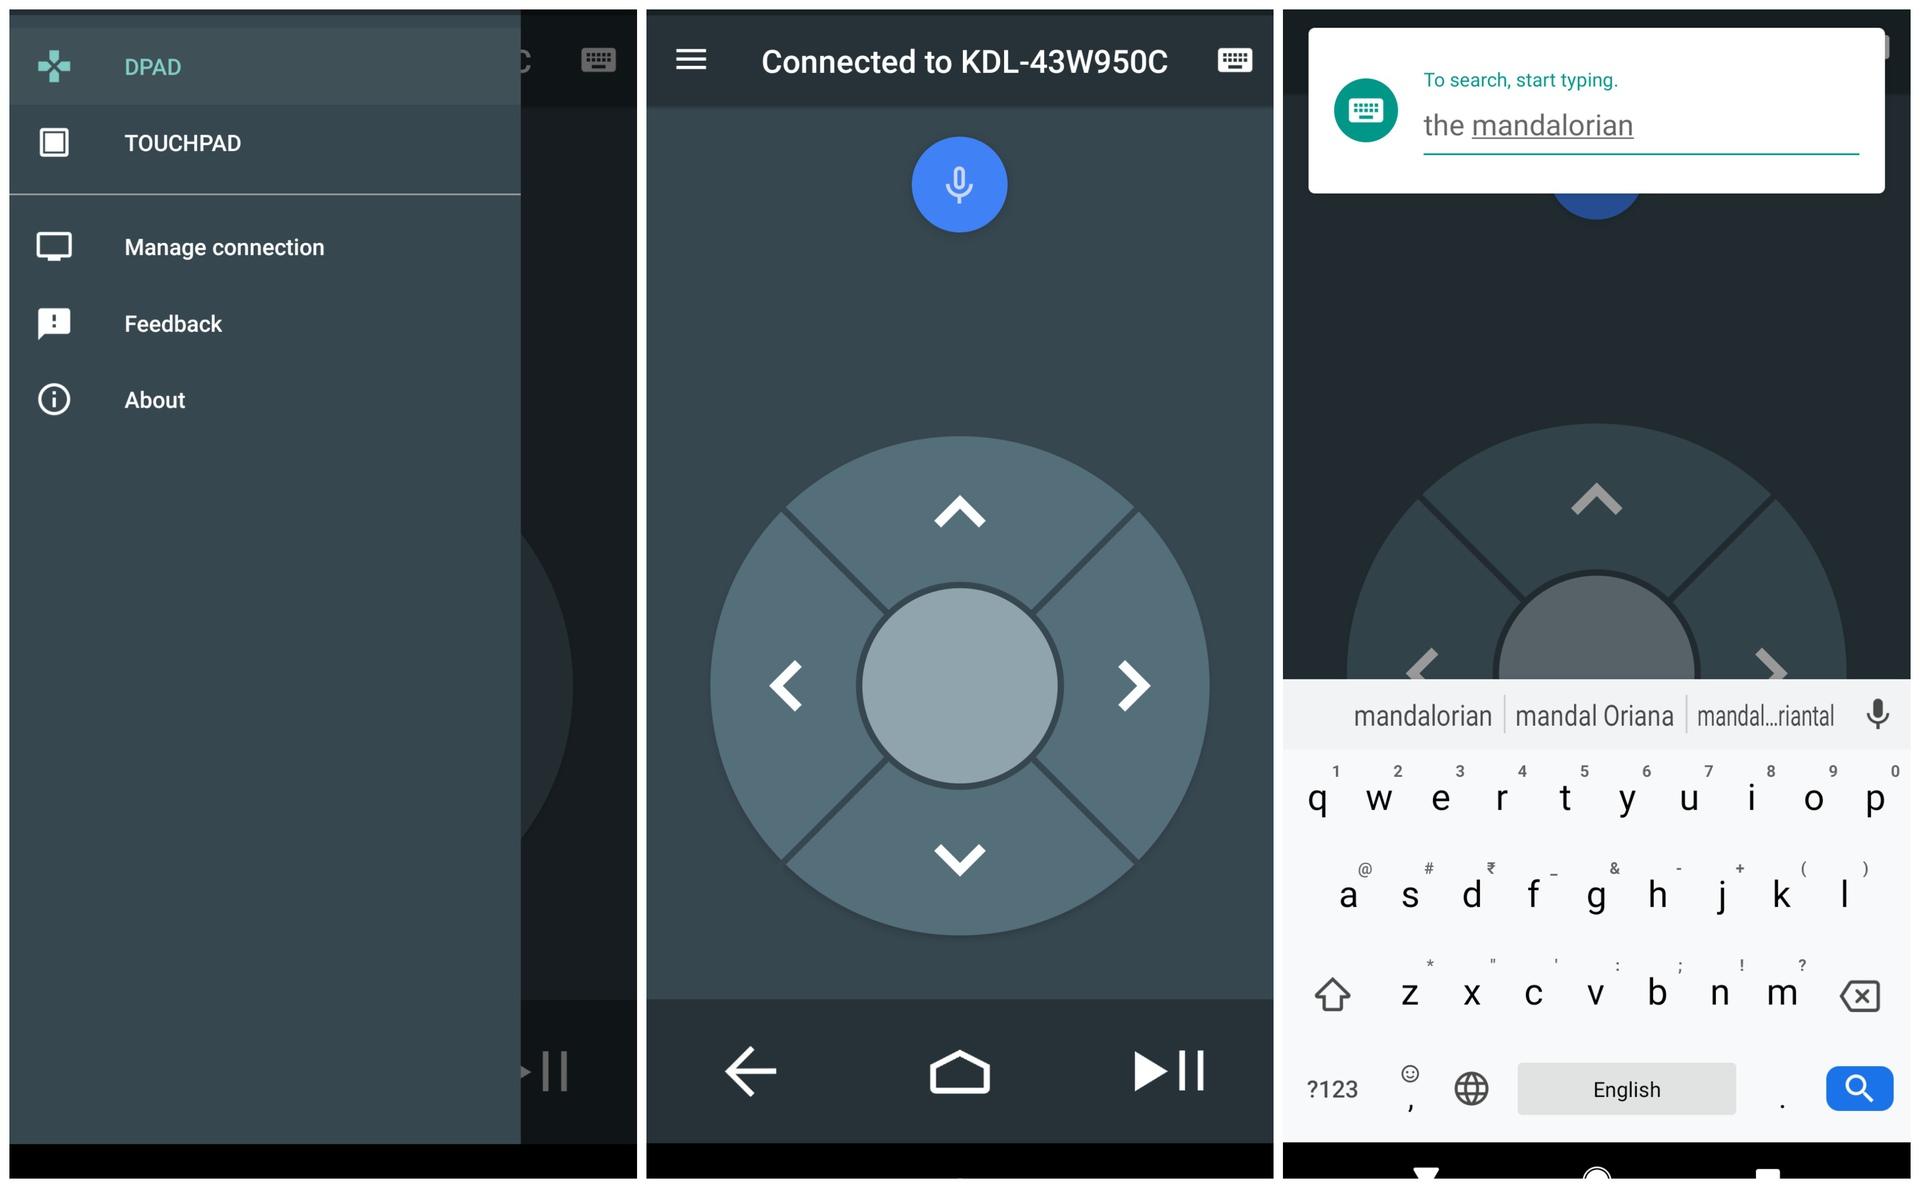 Android TV Remote Control app screenshots